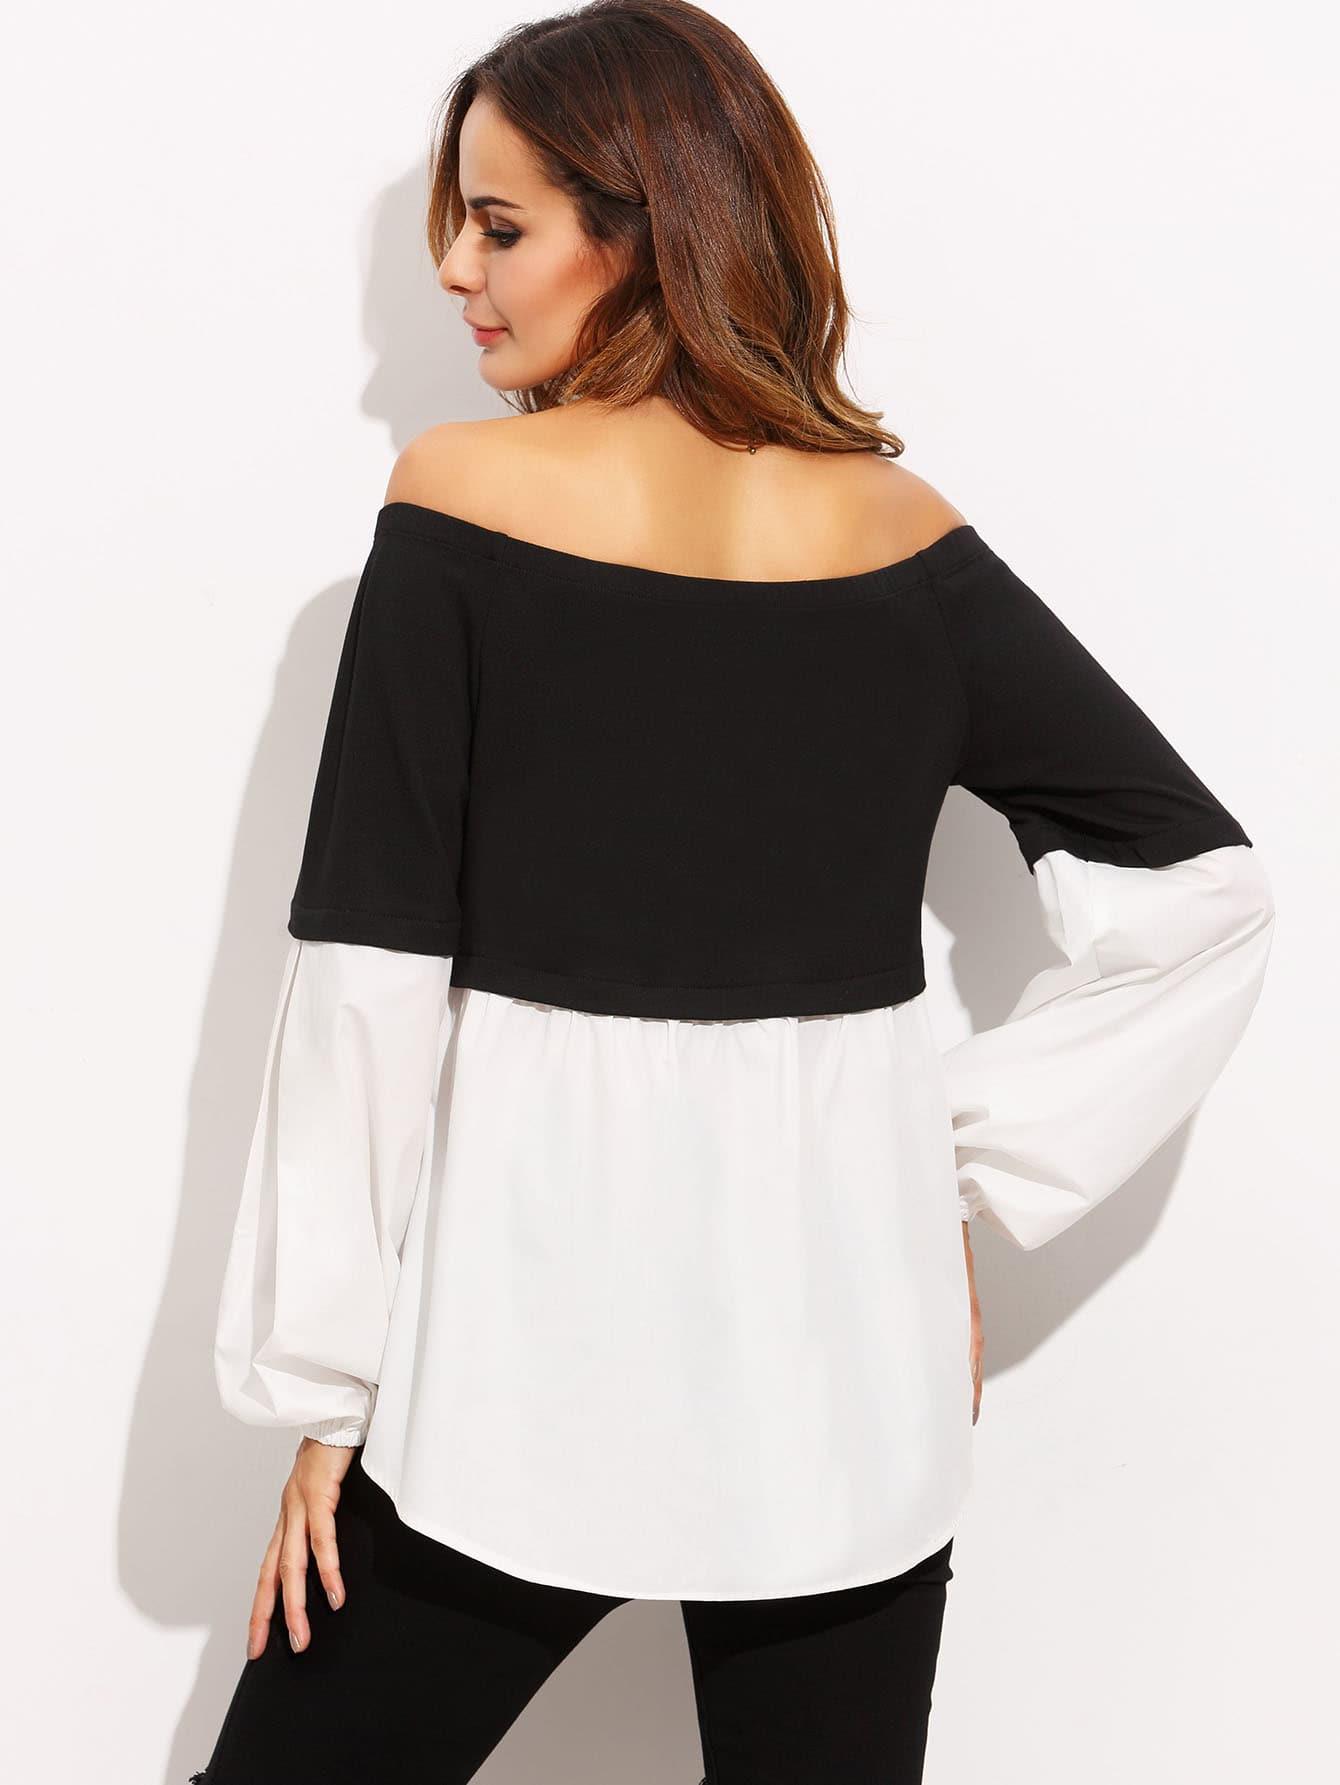 blouse160802702_4